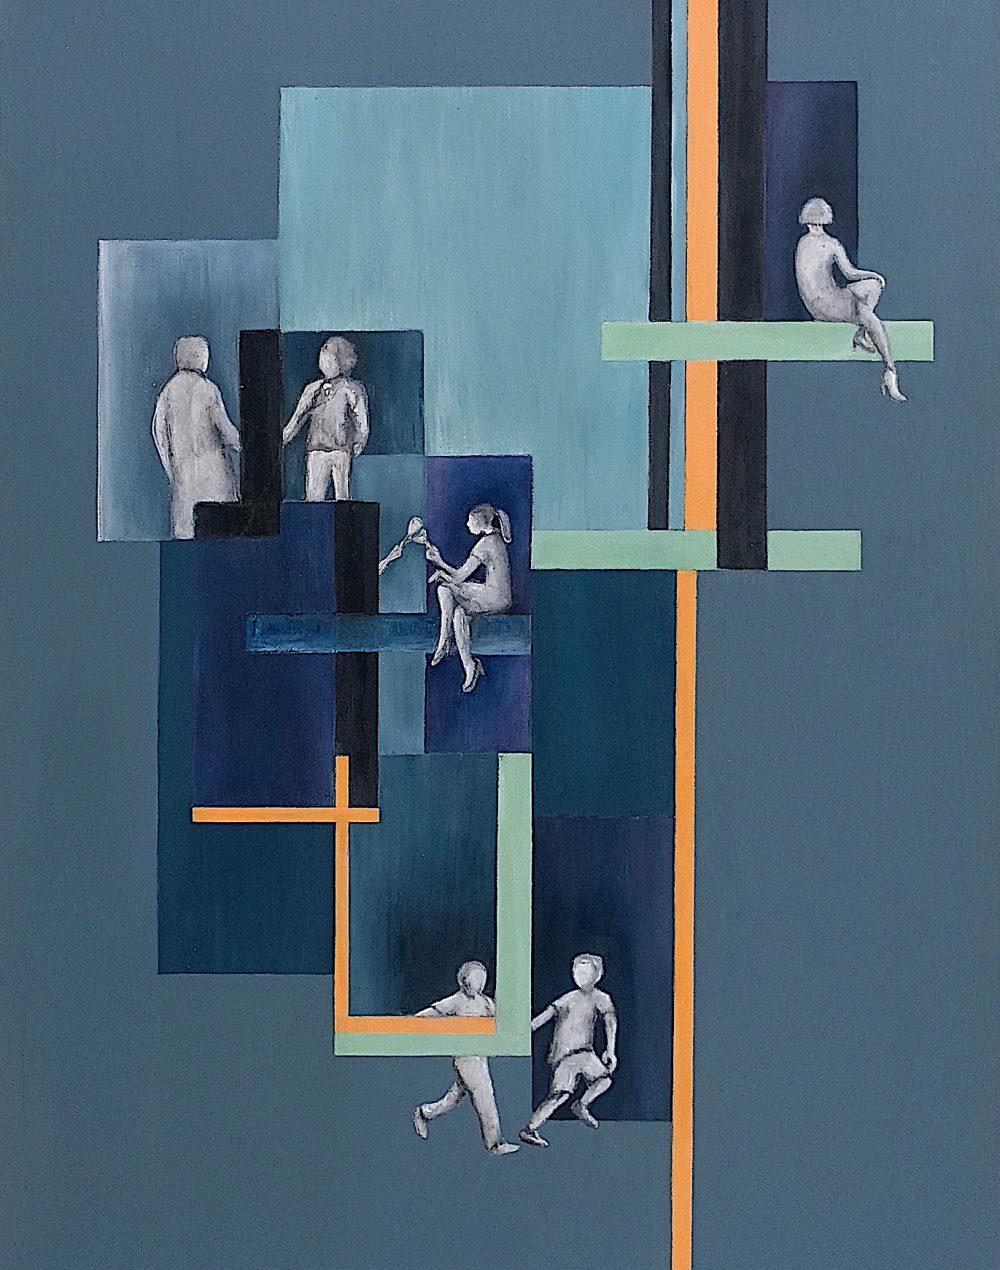 Walls between - 50 cm X 70 cm Acrylic Painting